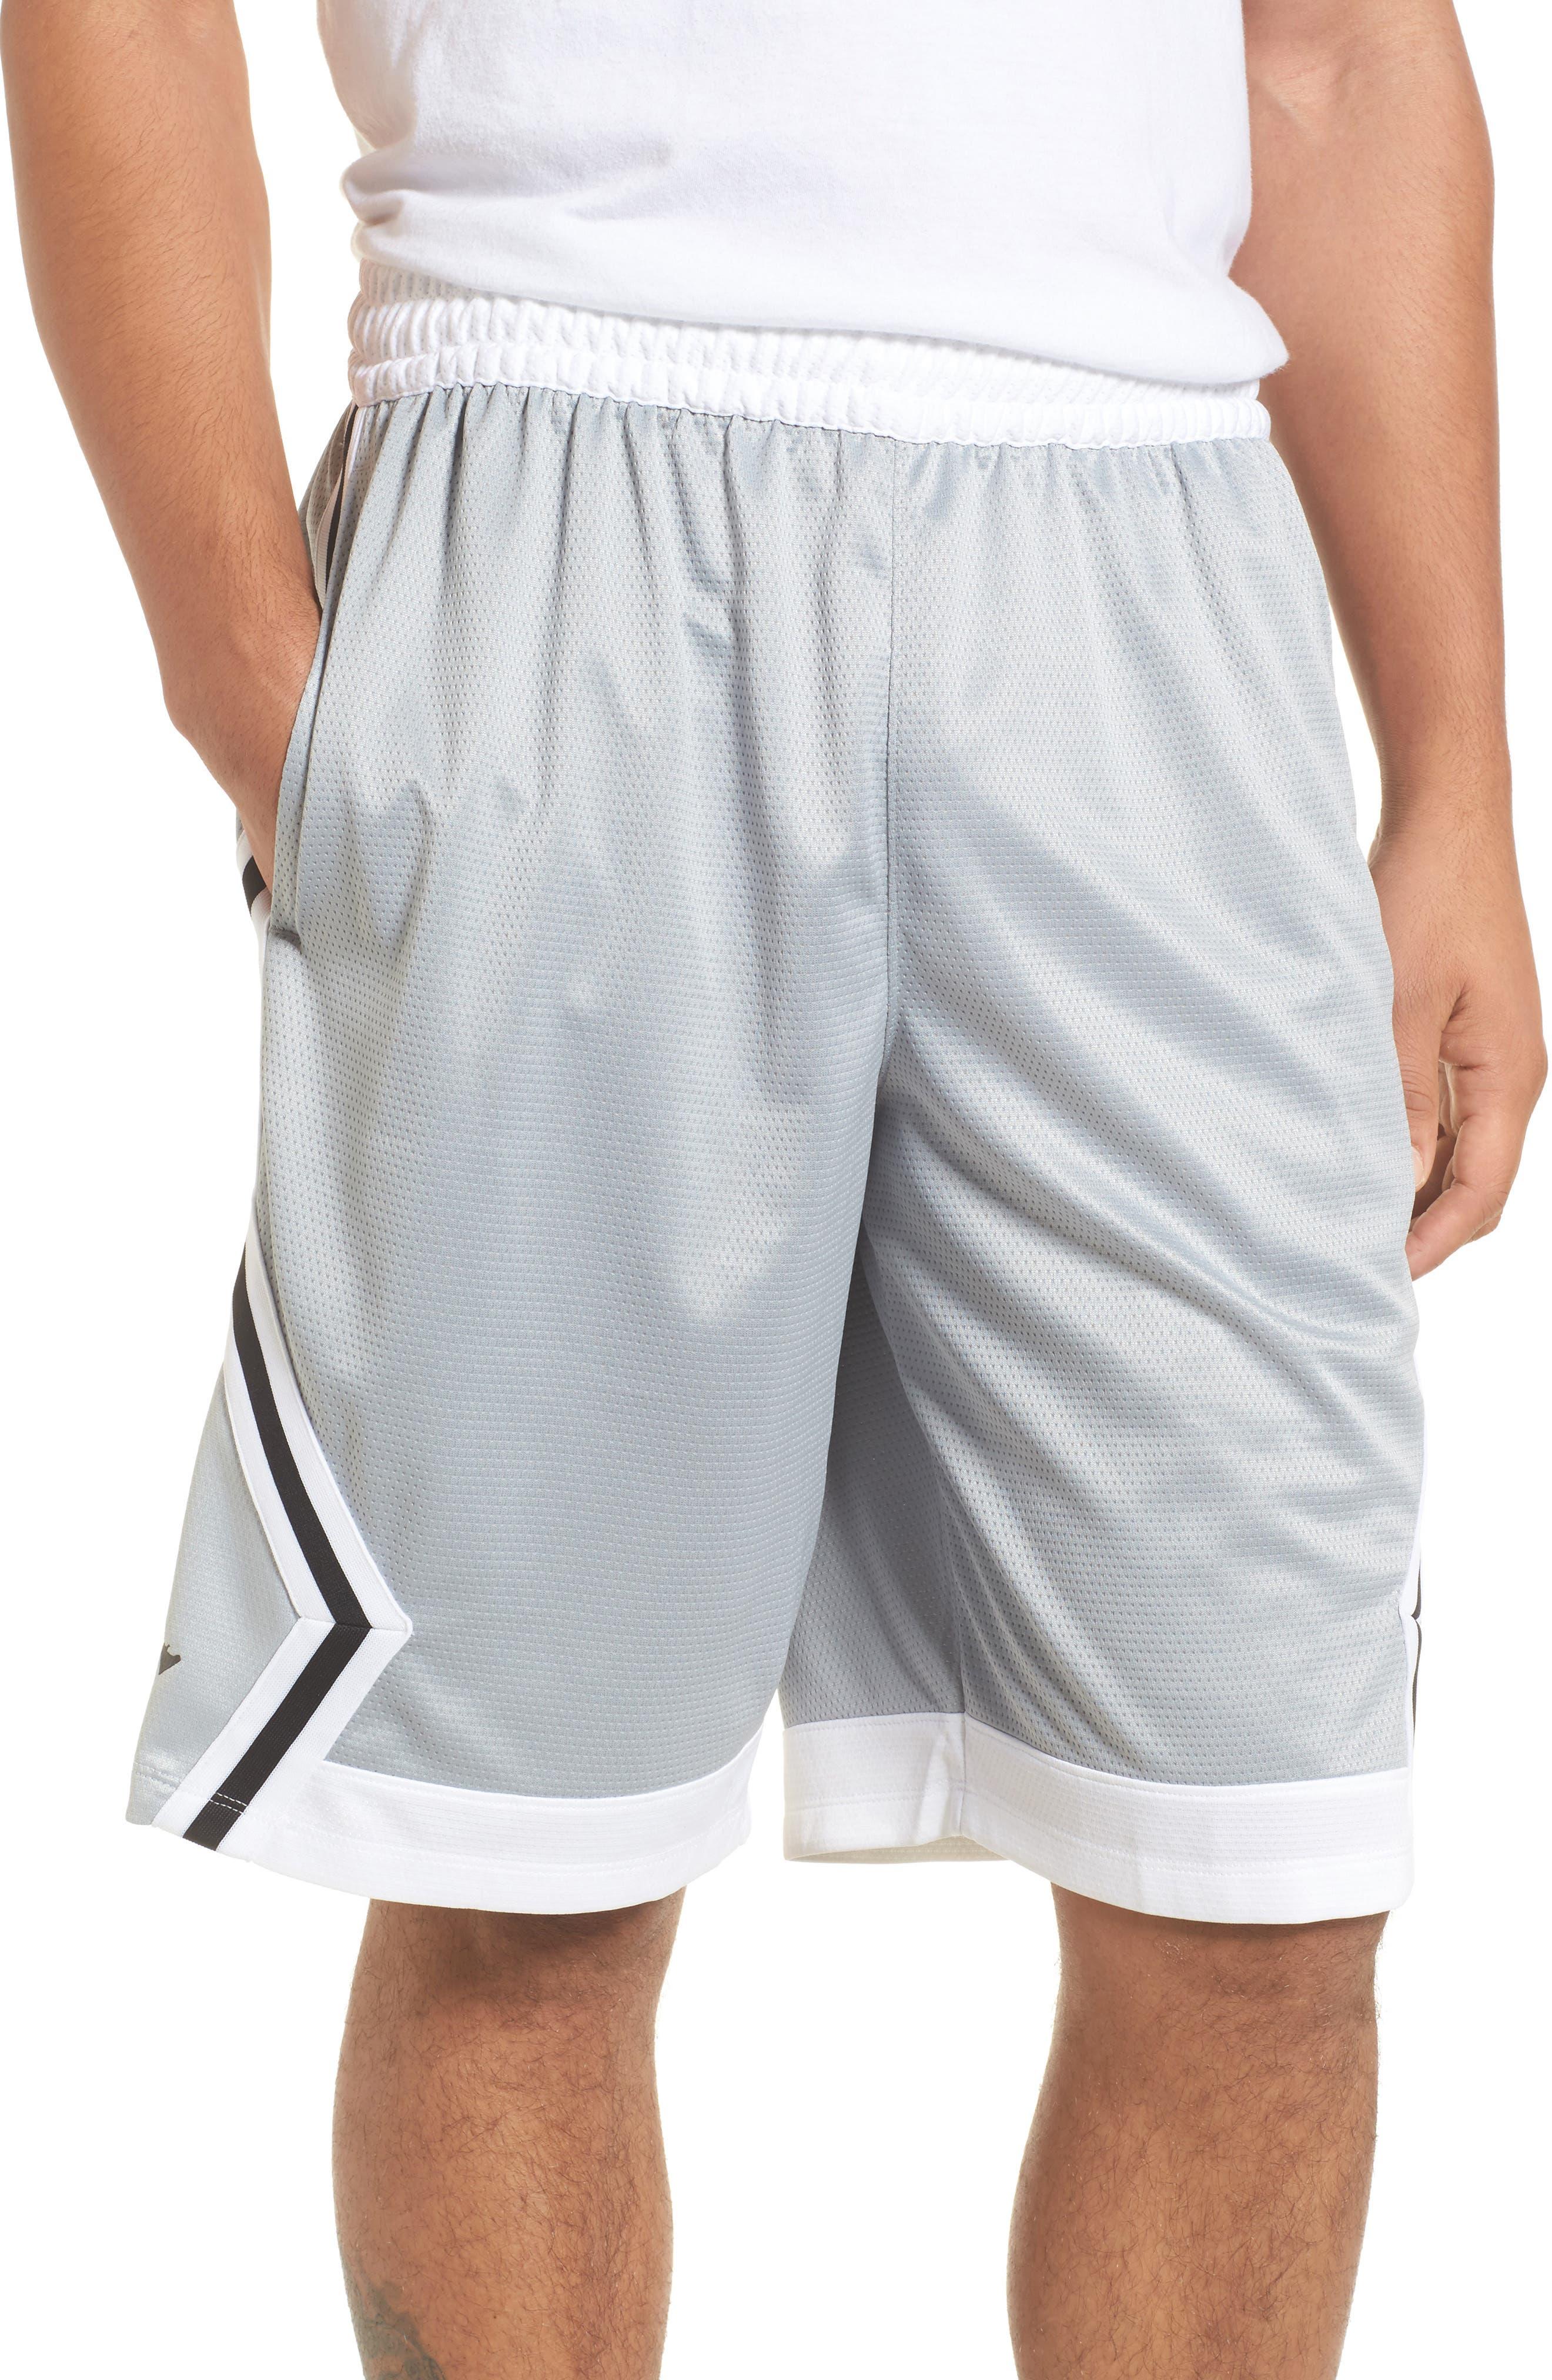 Sportswear Rise Diamond Shorts,                             Main thumbnail 1, color,                             011